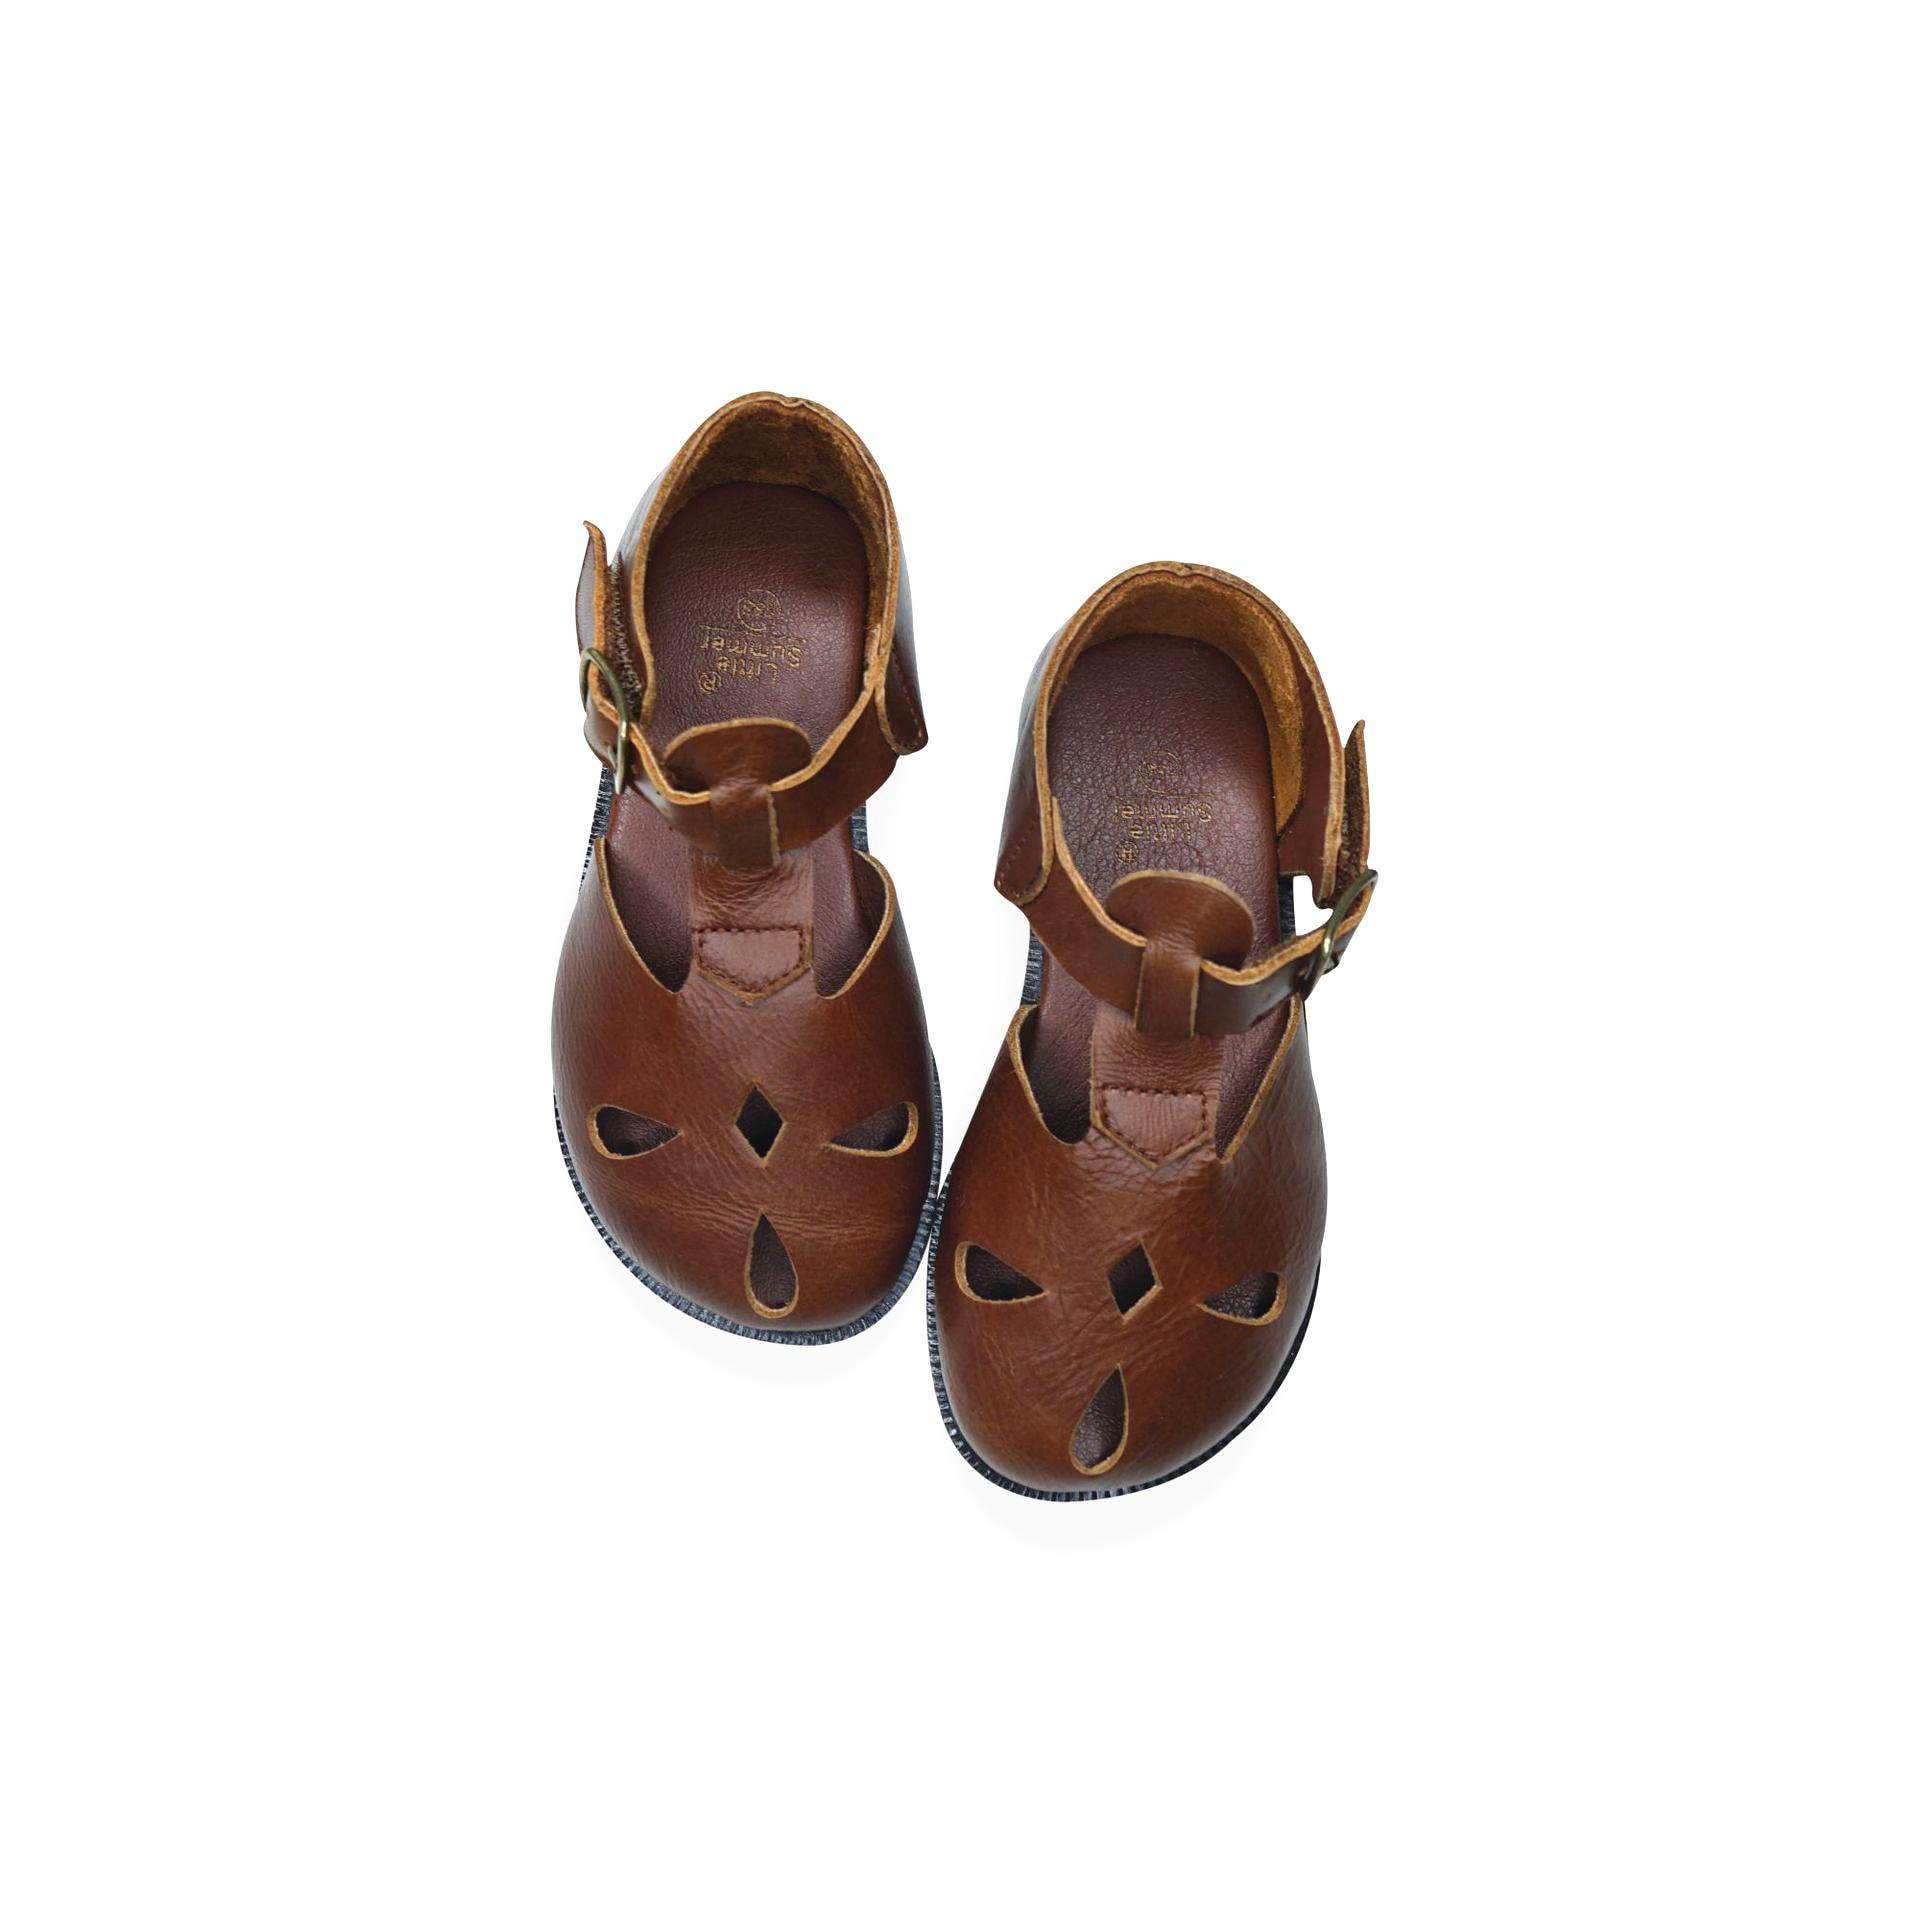 Cowhide Girls Sandals Retro Oil Wax Color Genuine Leather Baby Beach Shoes Kids Garden Sandals Summer Children's Sandals 6T